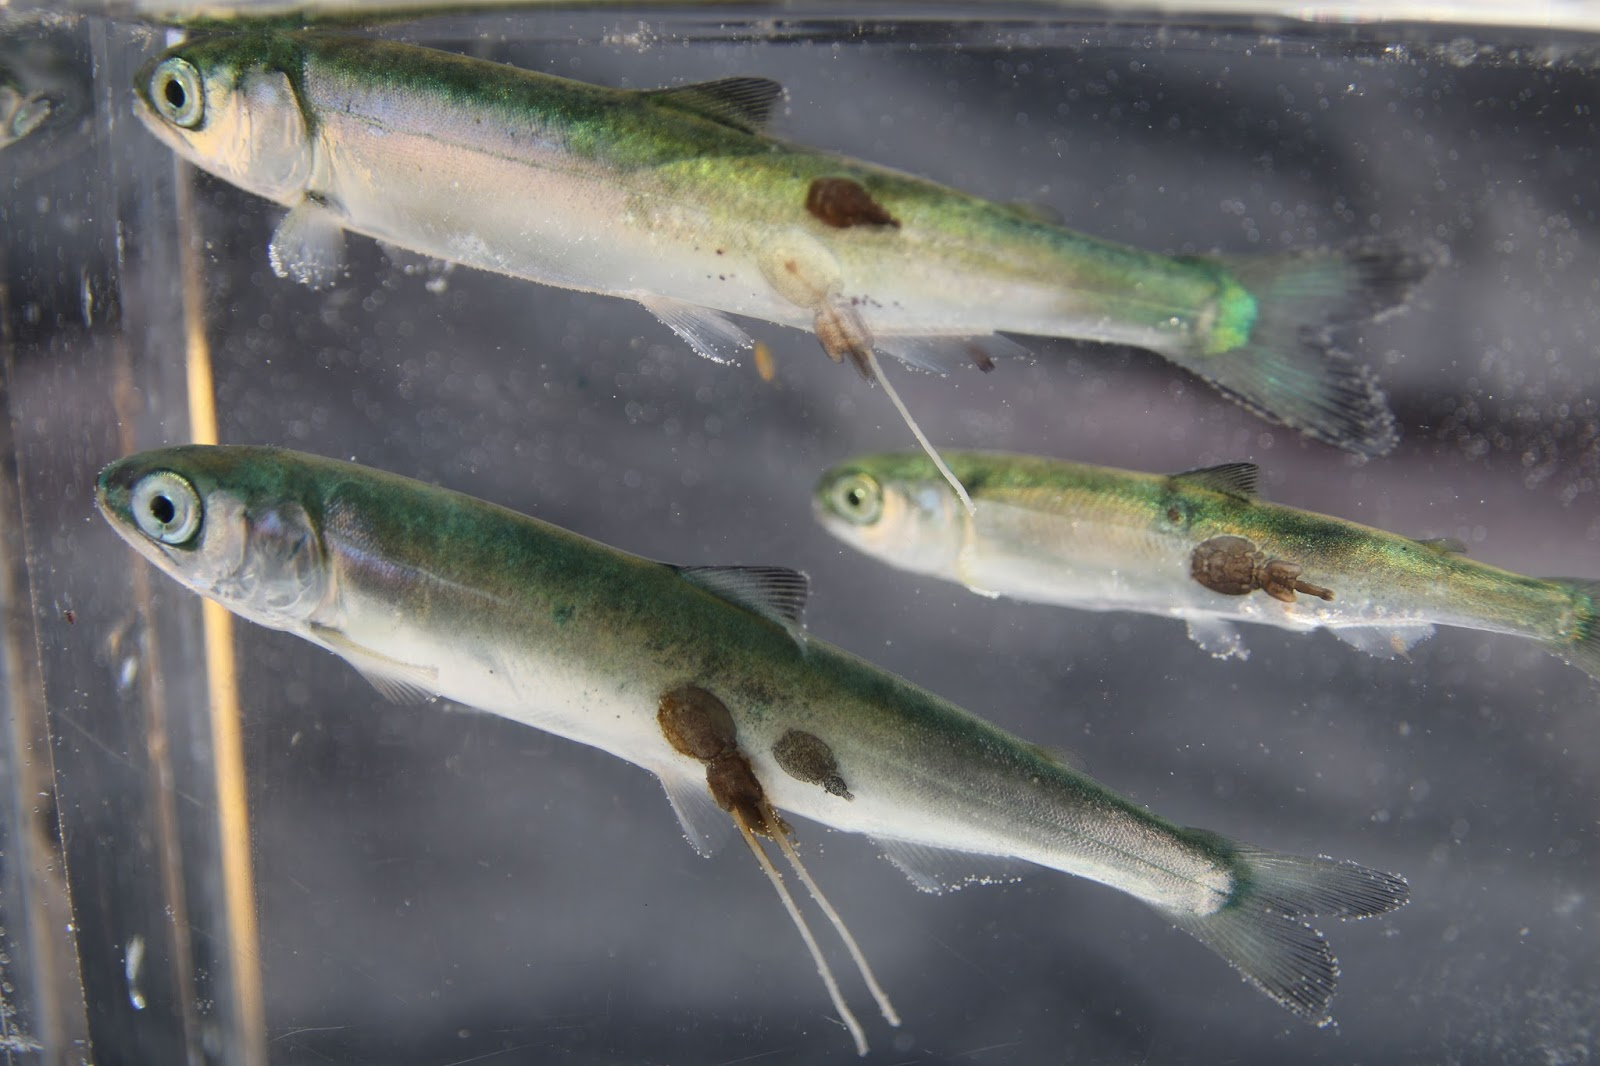 CHANS Lab Views: Do wild salmon subsidize the aquaculture